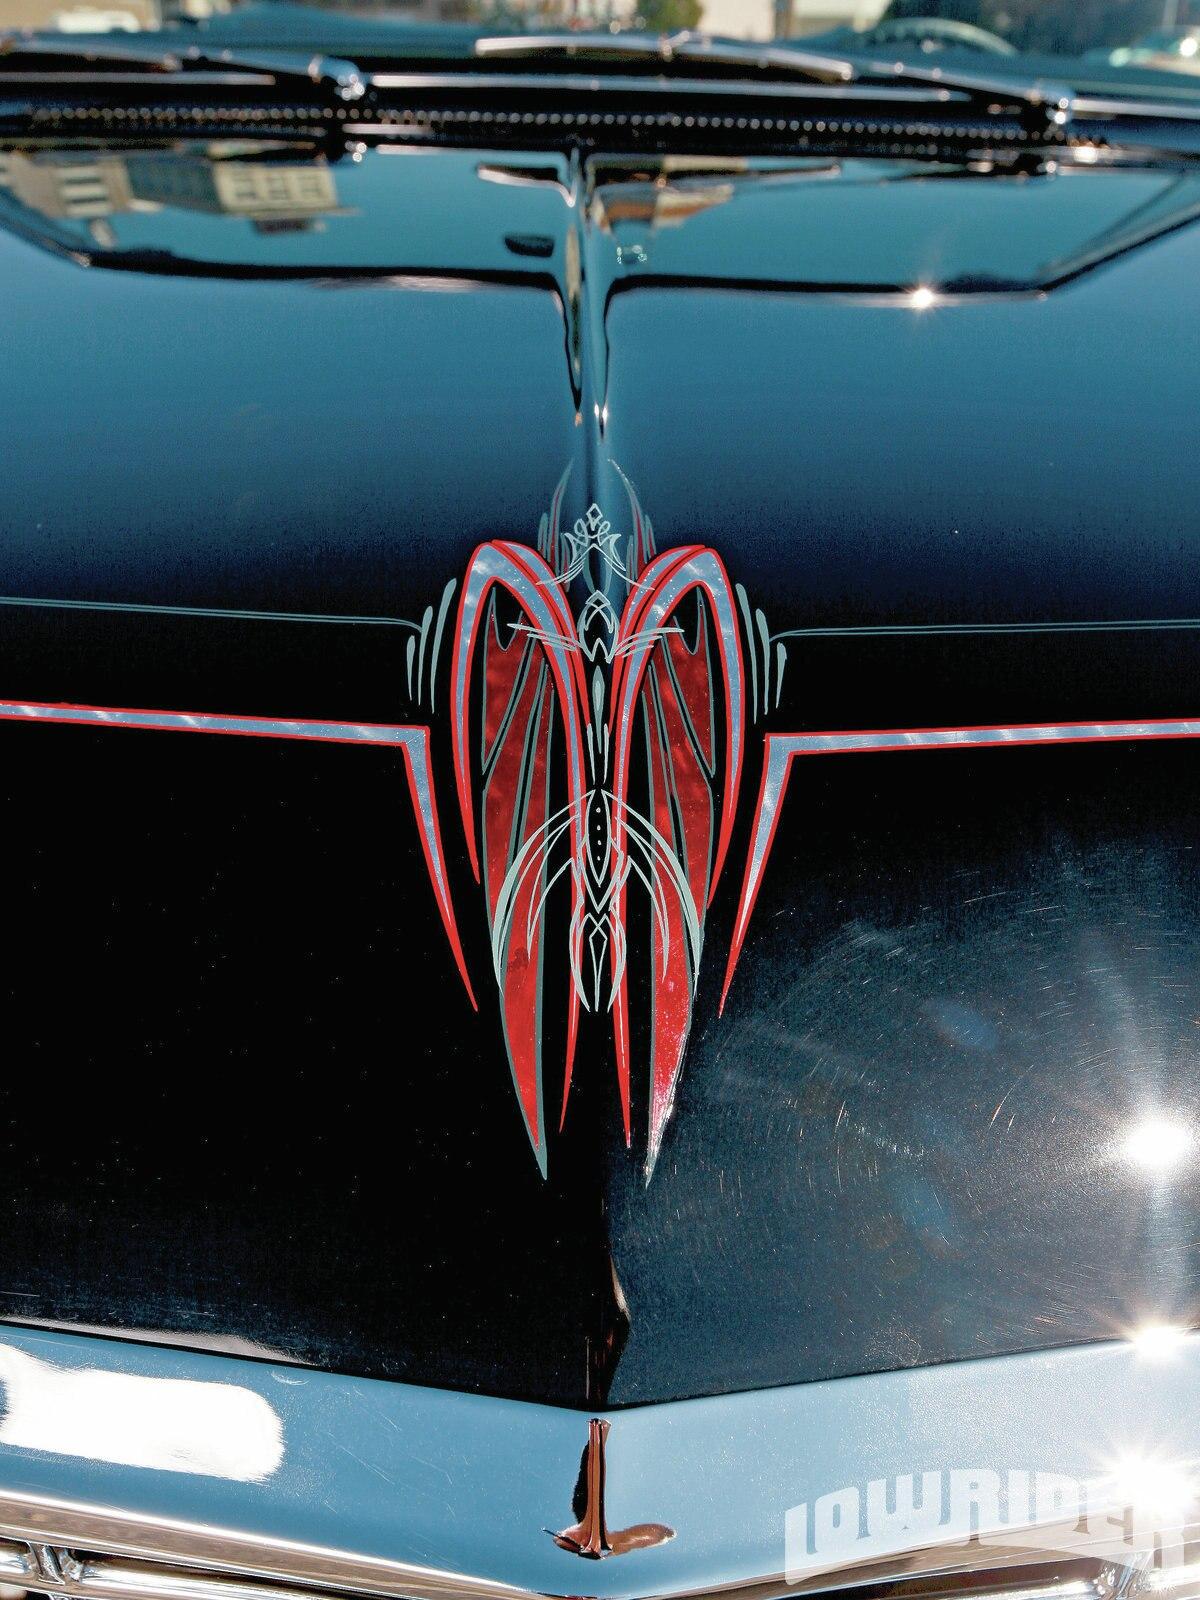 Old Classic Cars >> 1967 Chevrolet Impala Convertible - Lowrider Magazine